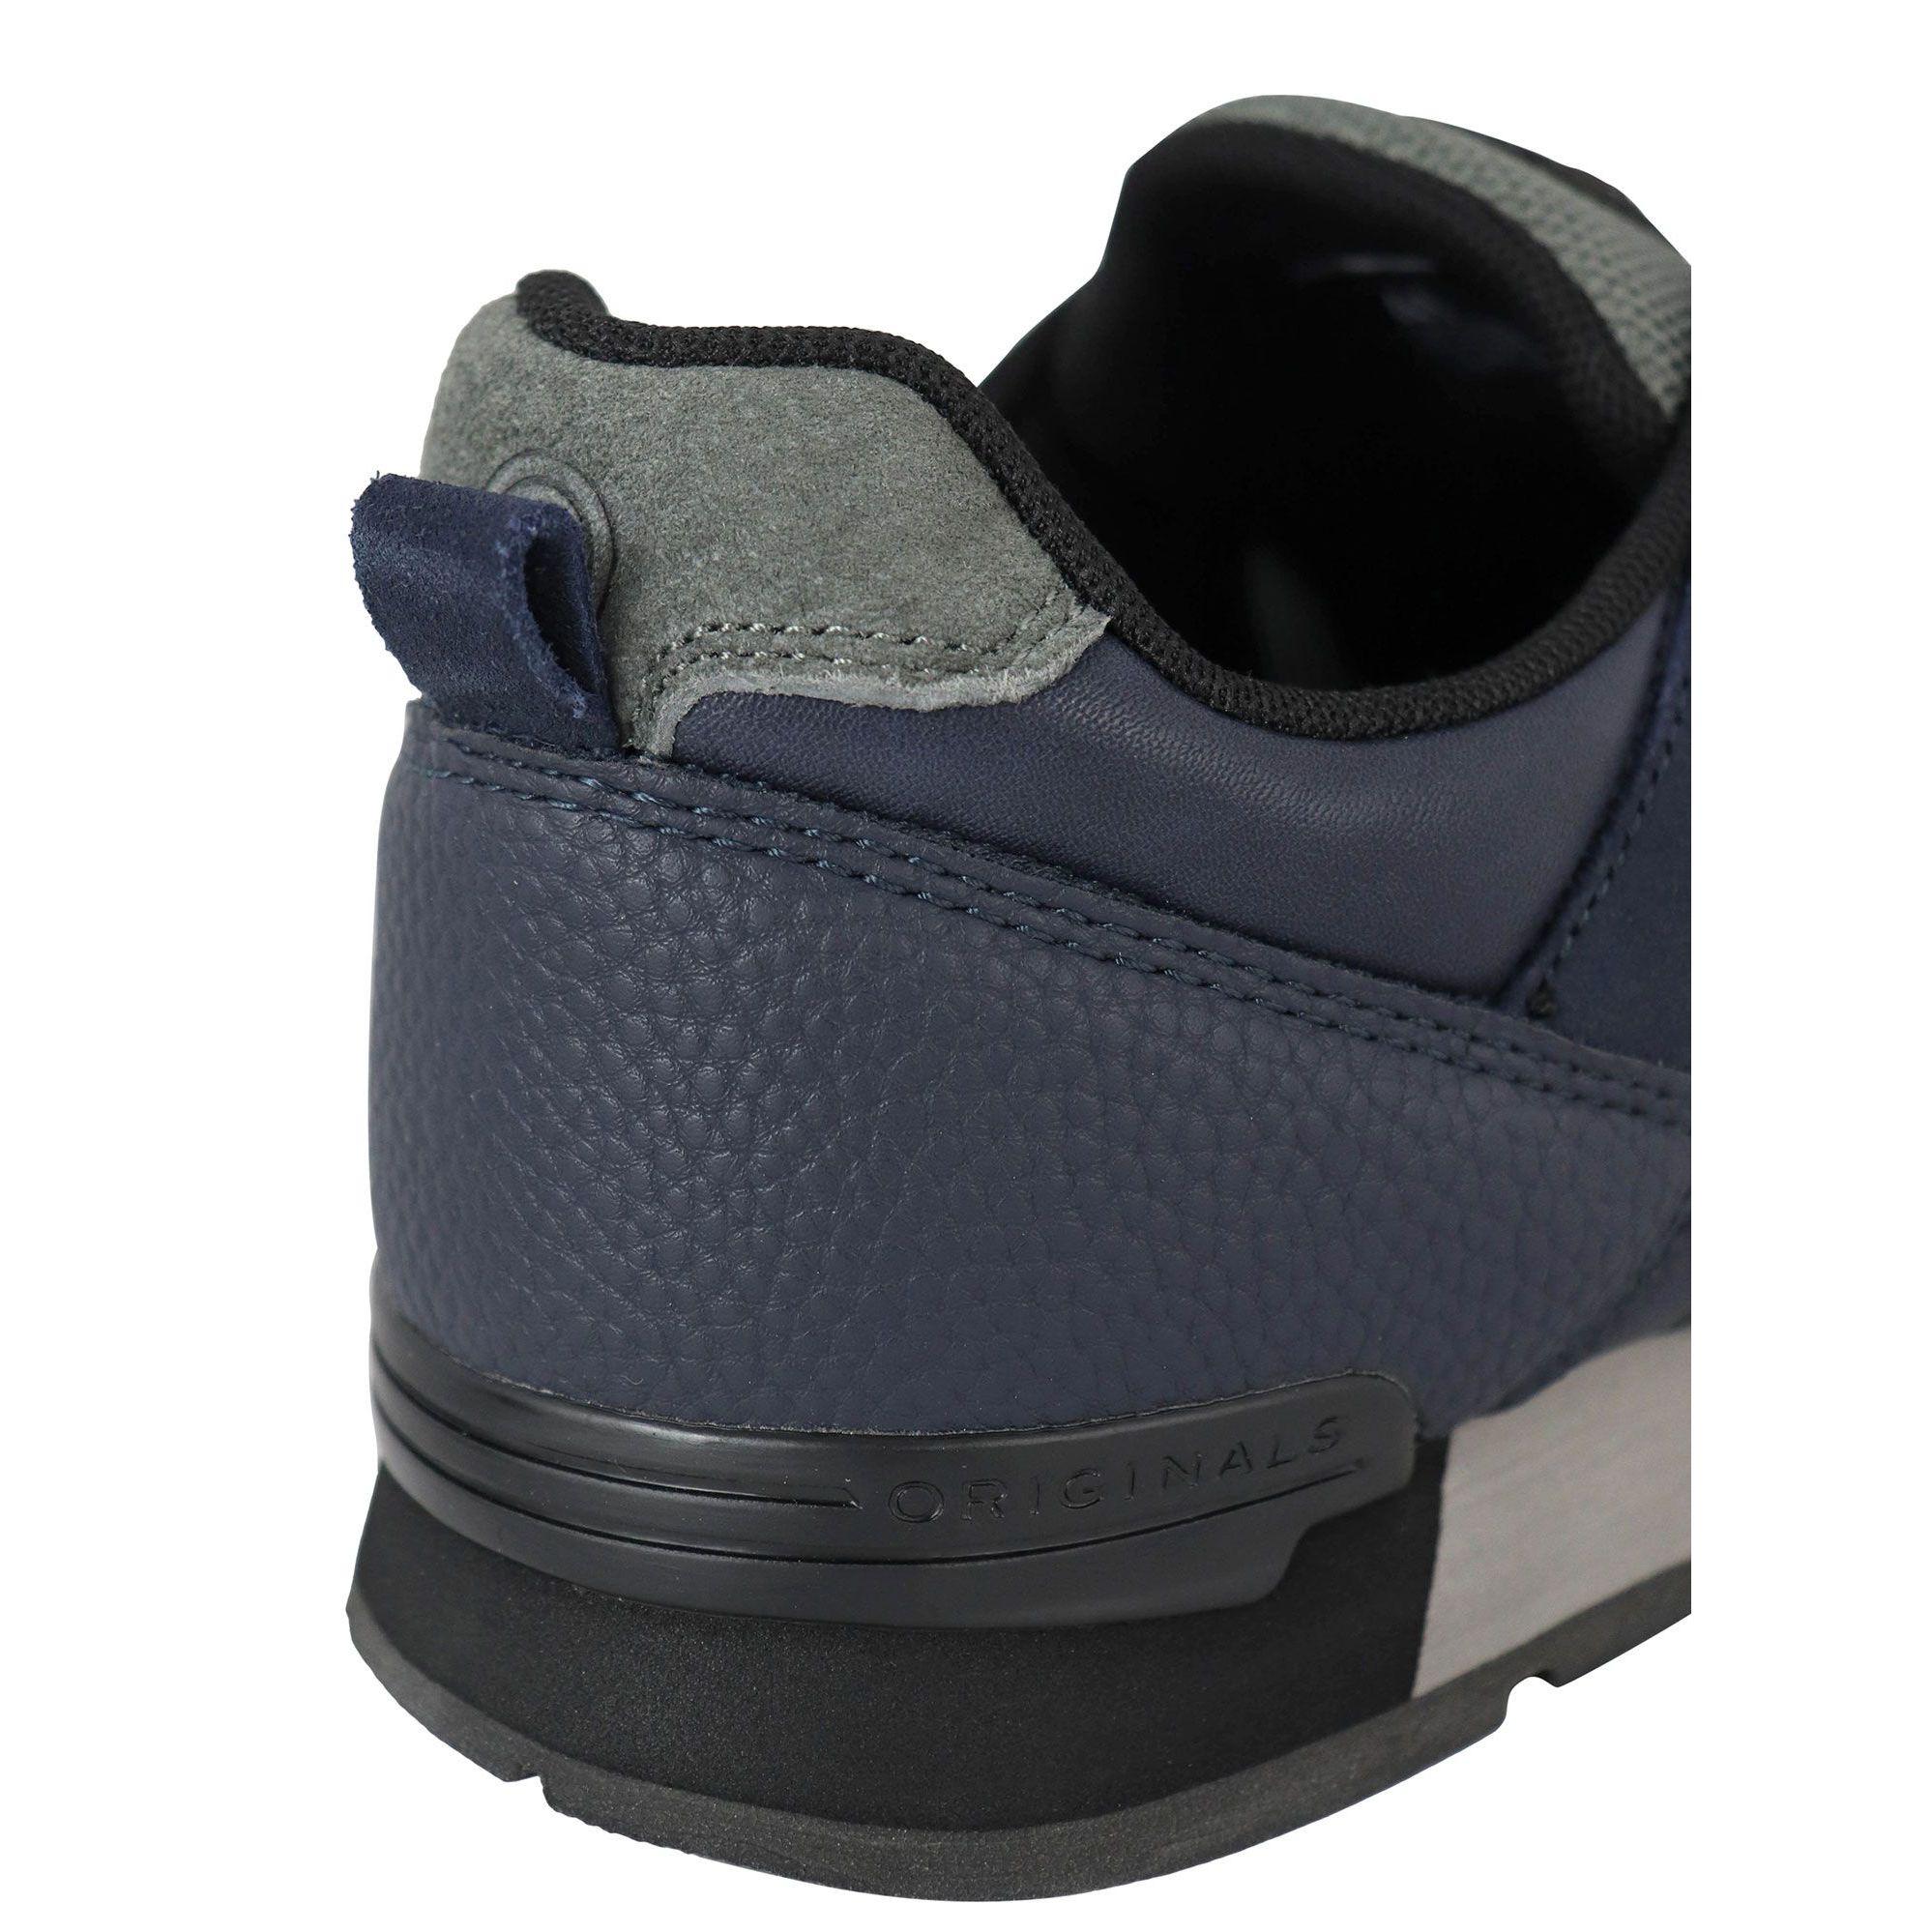 Runner Prime Sneakers